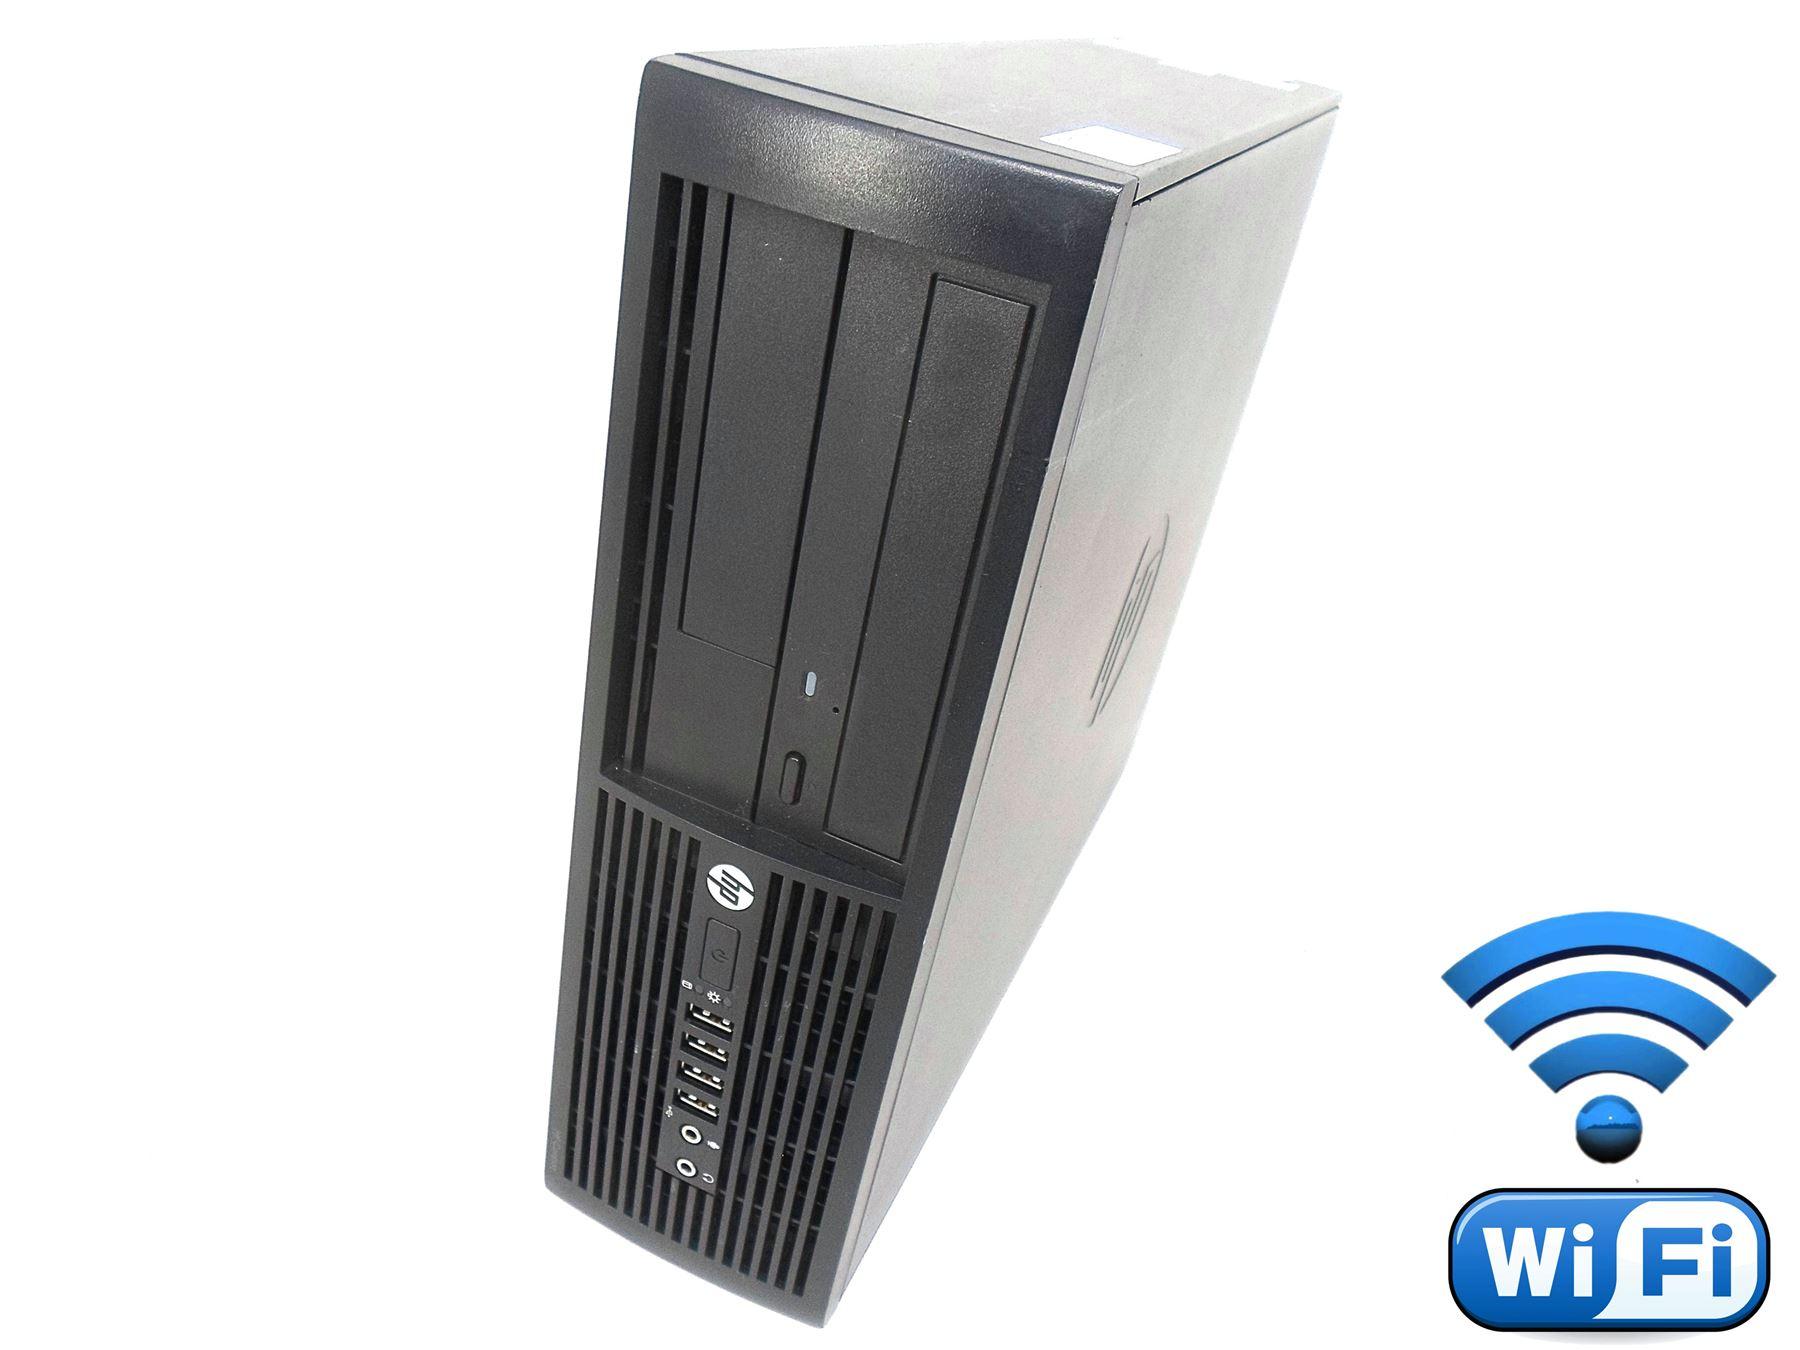 Hp compaq 4000 pro drivers for windows 7